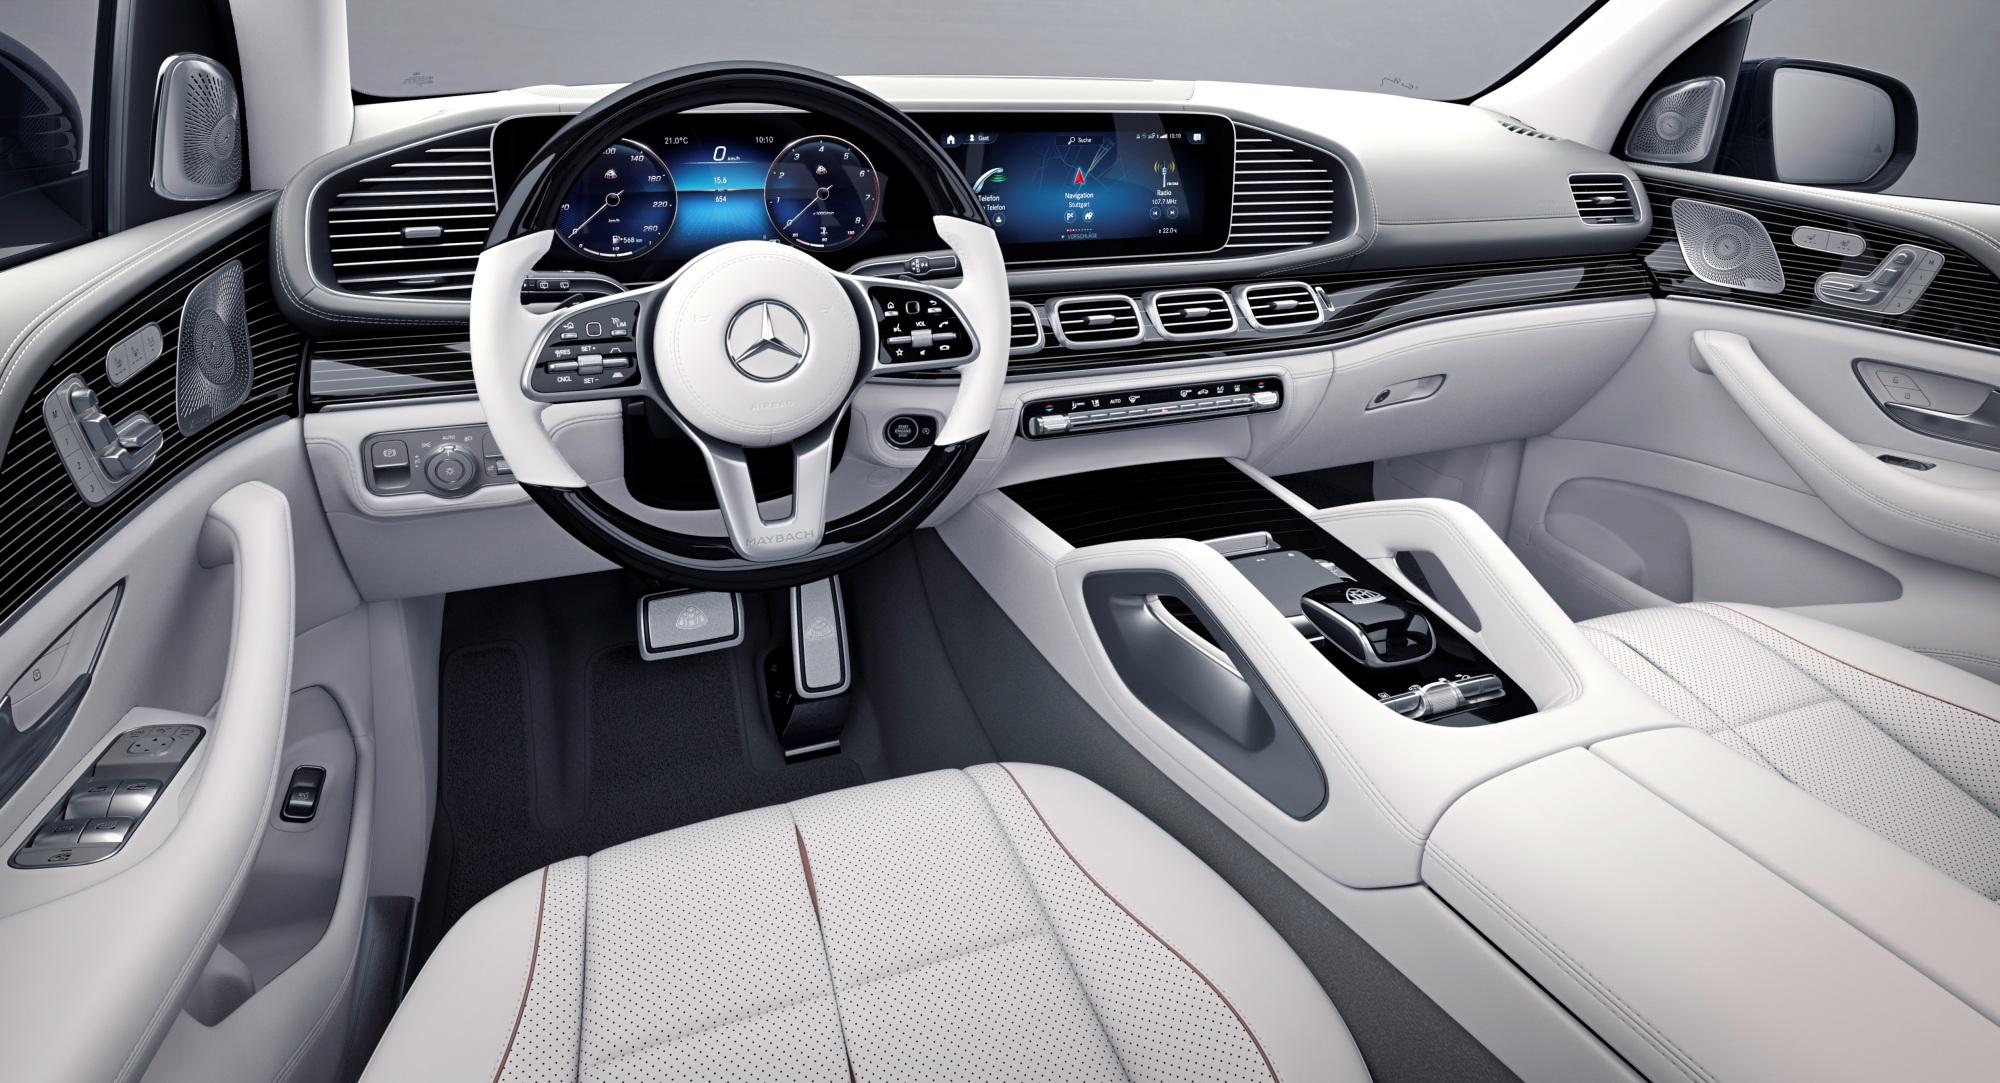 Mercedes-Maybach GLS deska